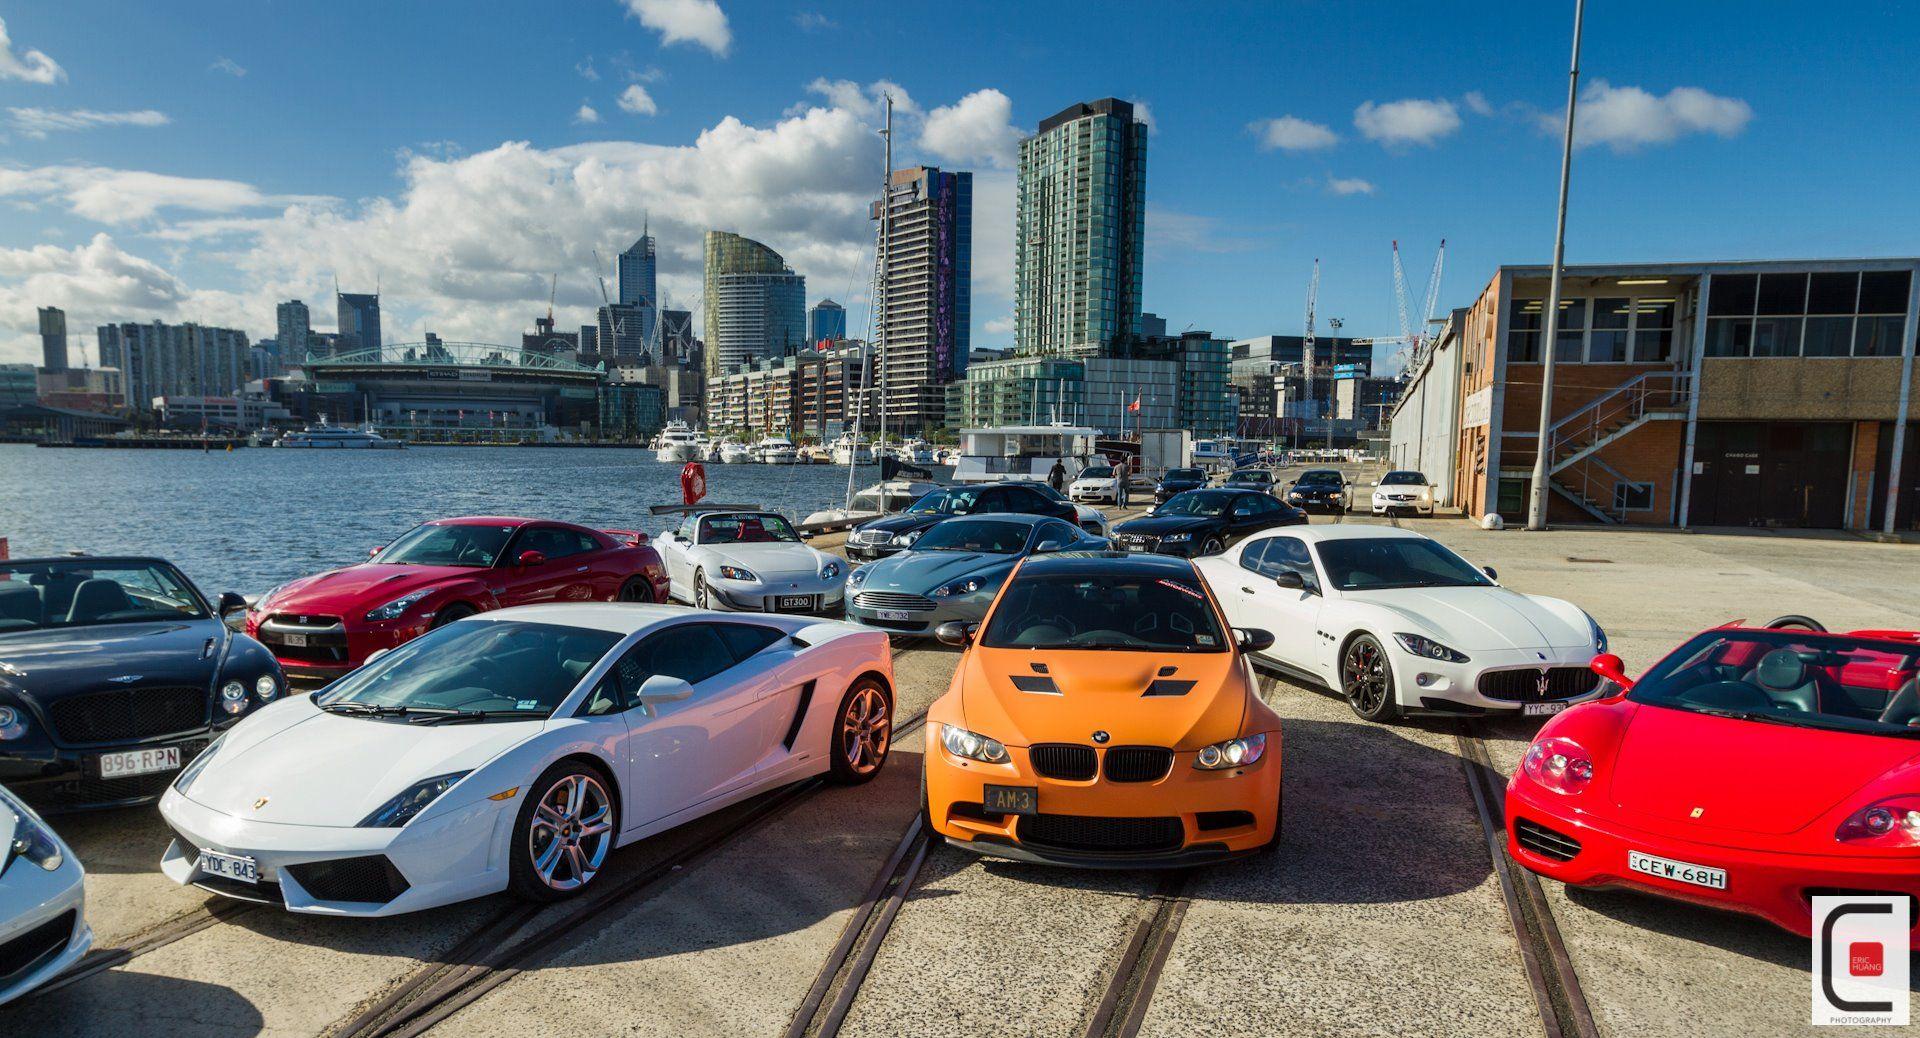 melbourne australia welcome photo driveday sydney an lamborghini hire exotic ferrari page rental convertible finest luxury porsche and professionals to sports bmw sport s car